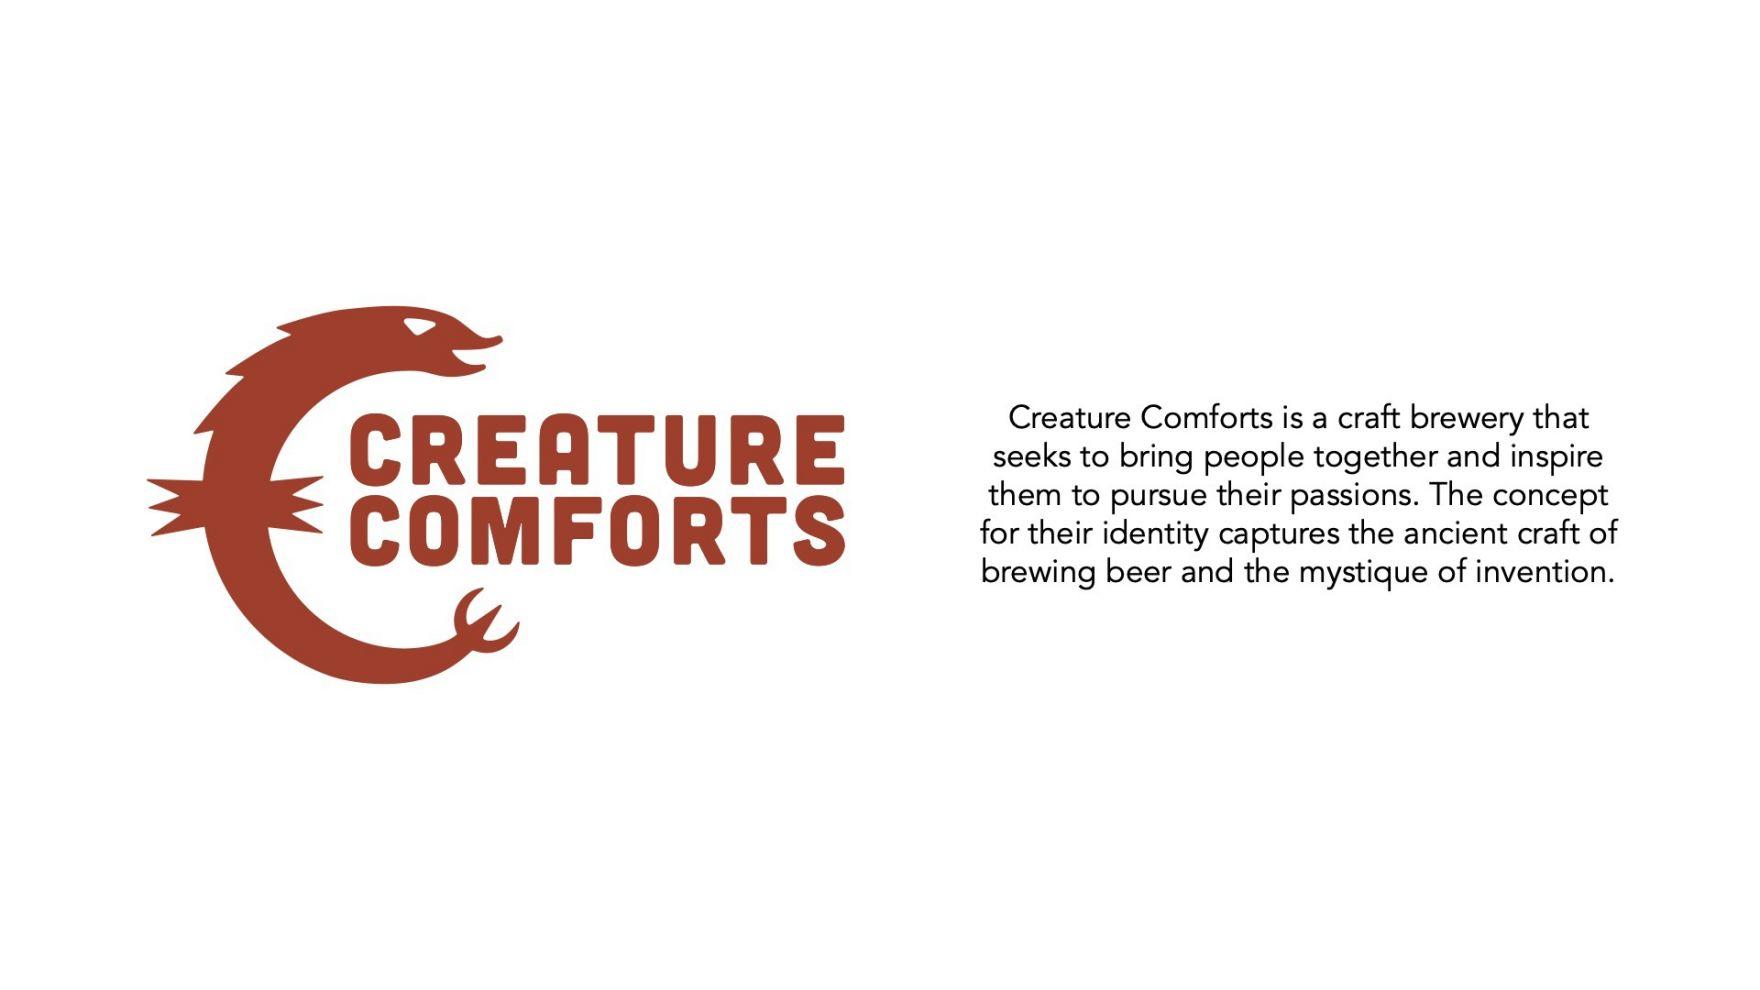 Creature_Comforts_Identity-01-91